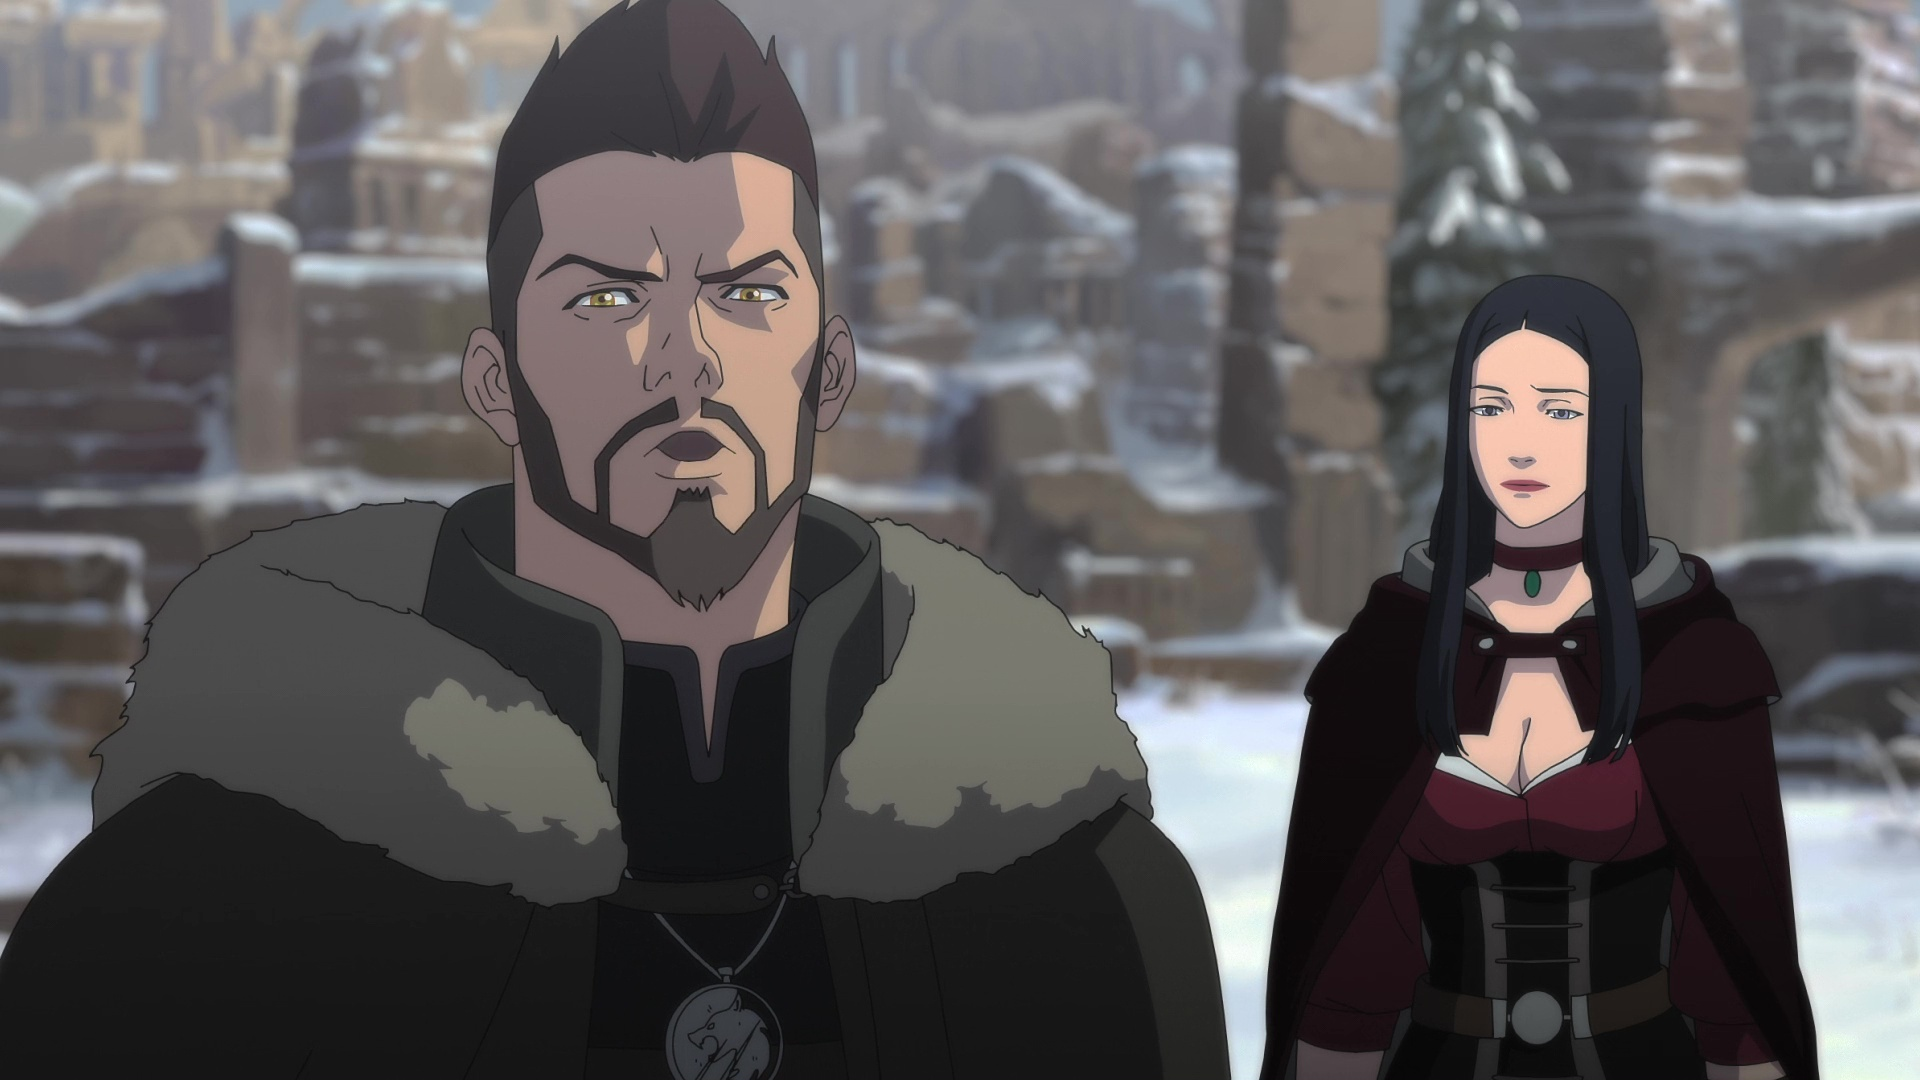 The Witcher: La pesadilla del lobo (2021) 1080p 60FPS WEB-DL Latino